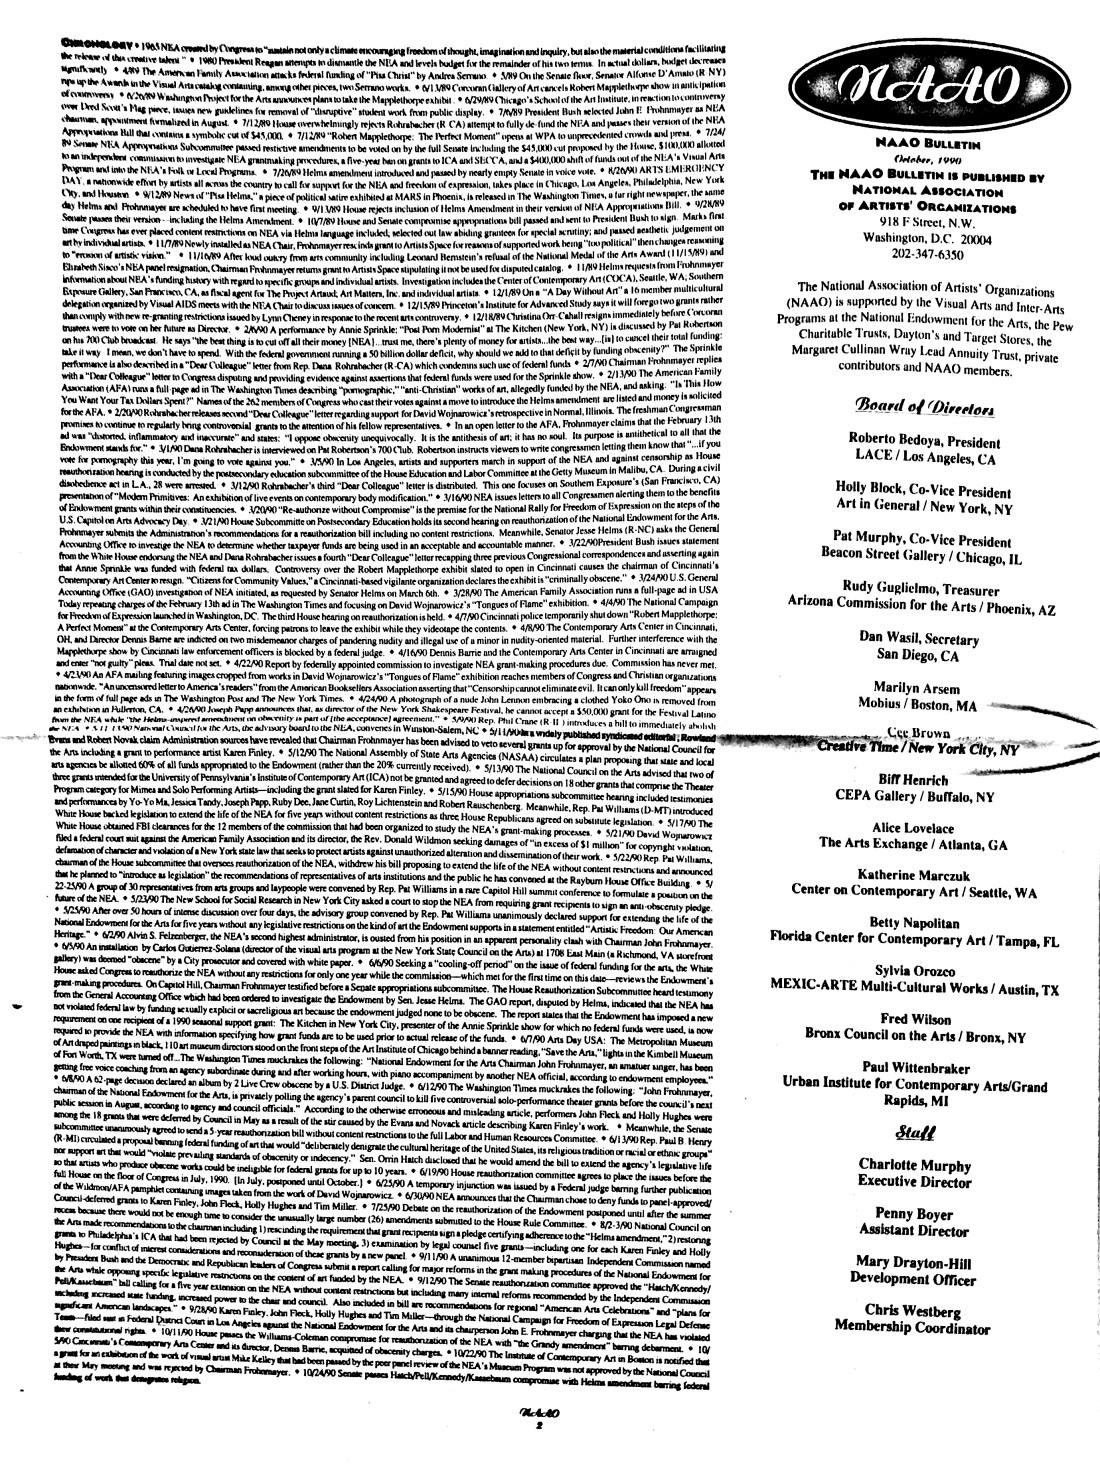 October 1990 - NAAO Bulletin Page 2.jpg